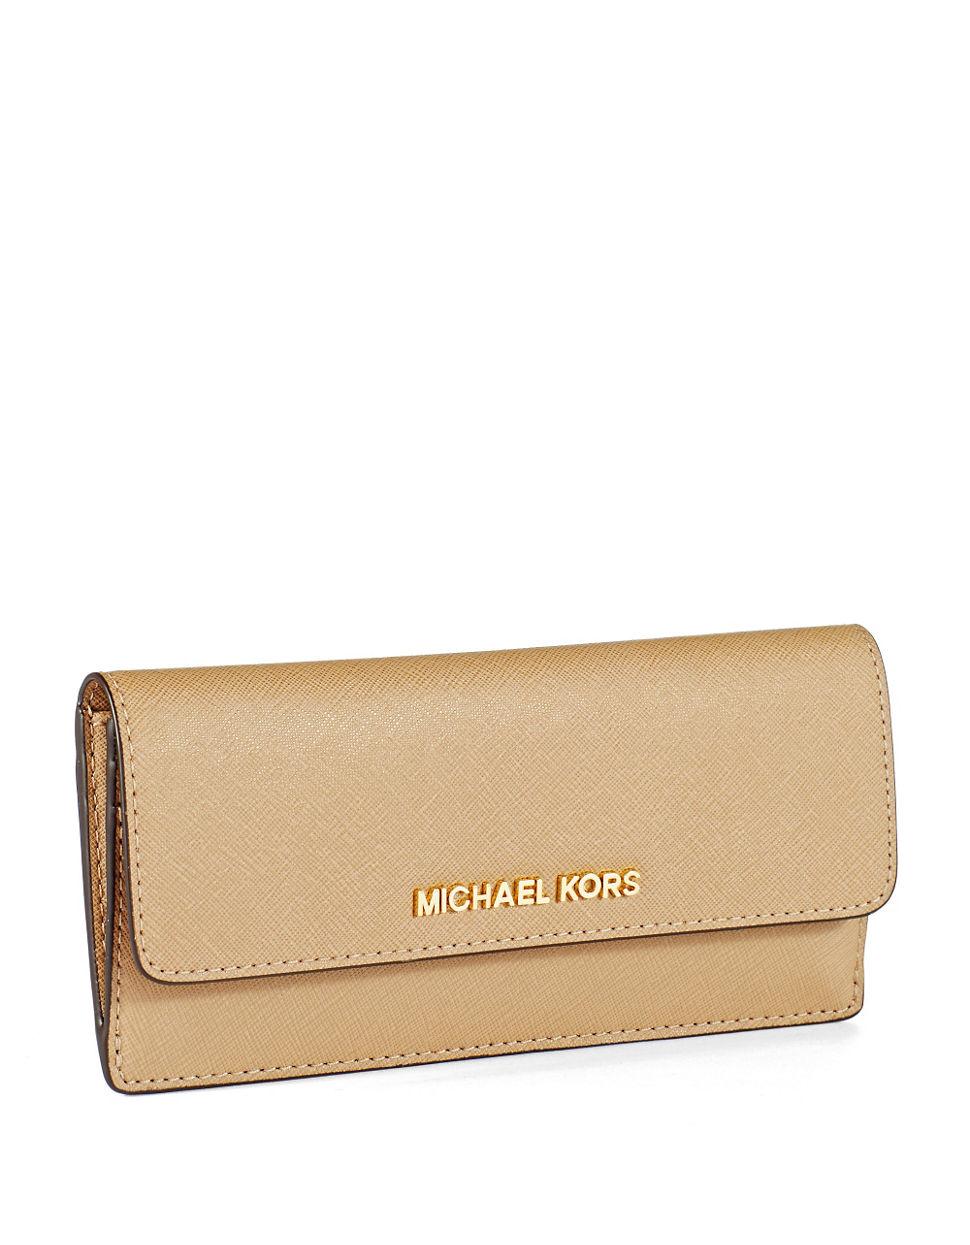 2ff908bd32e9 MICHAEL Michael Kors Jet Set Leather Travel Flat Wallet in Natural ...